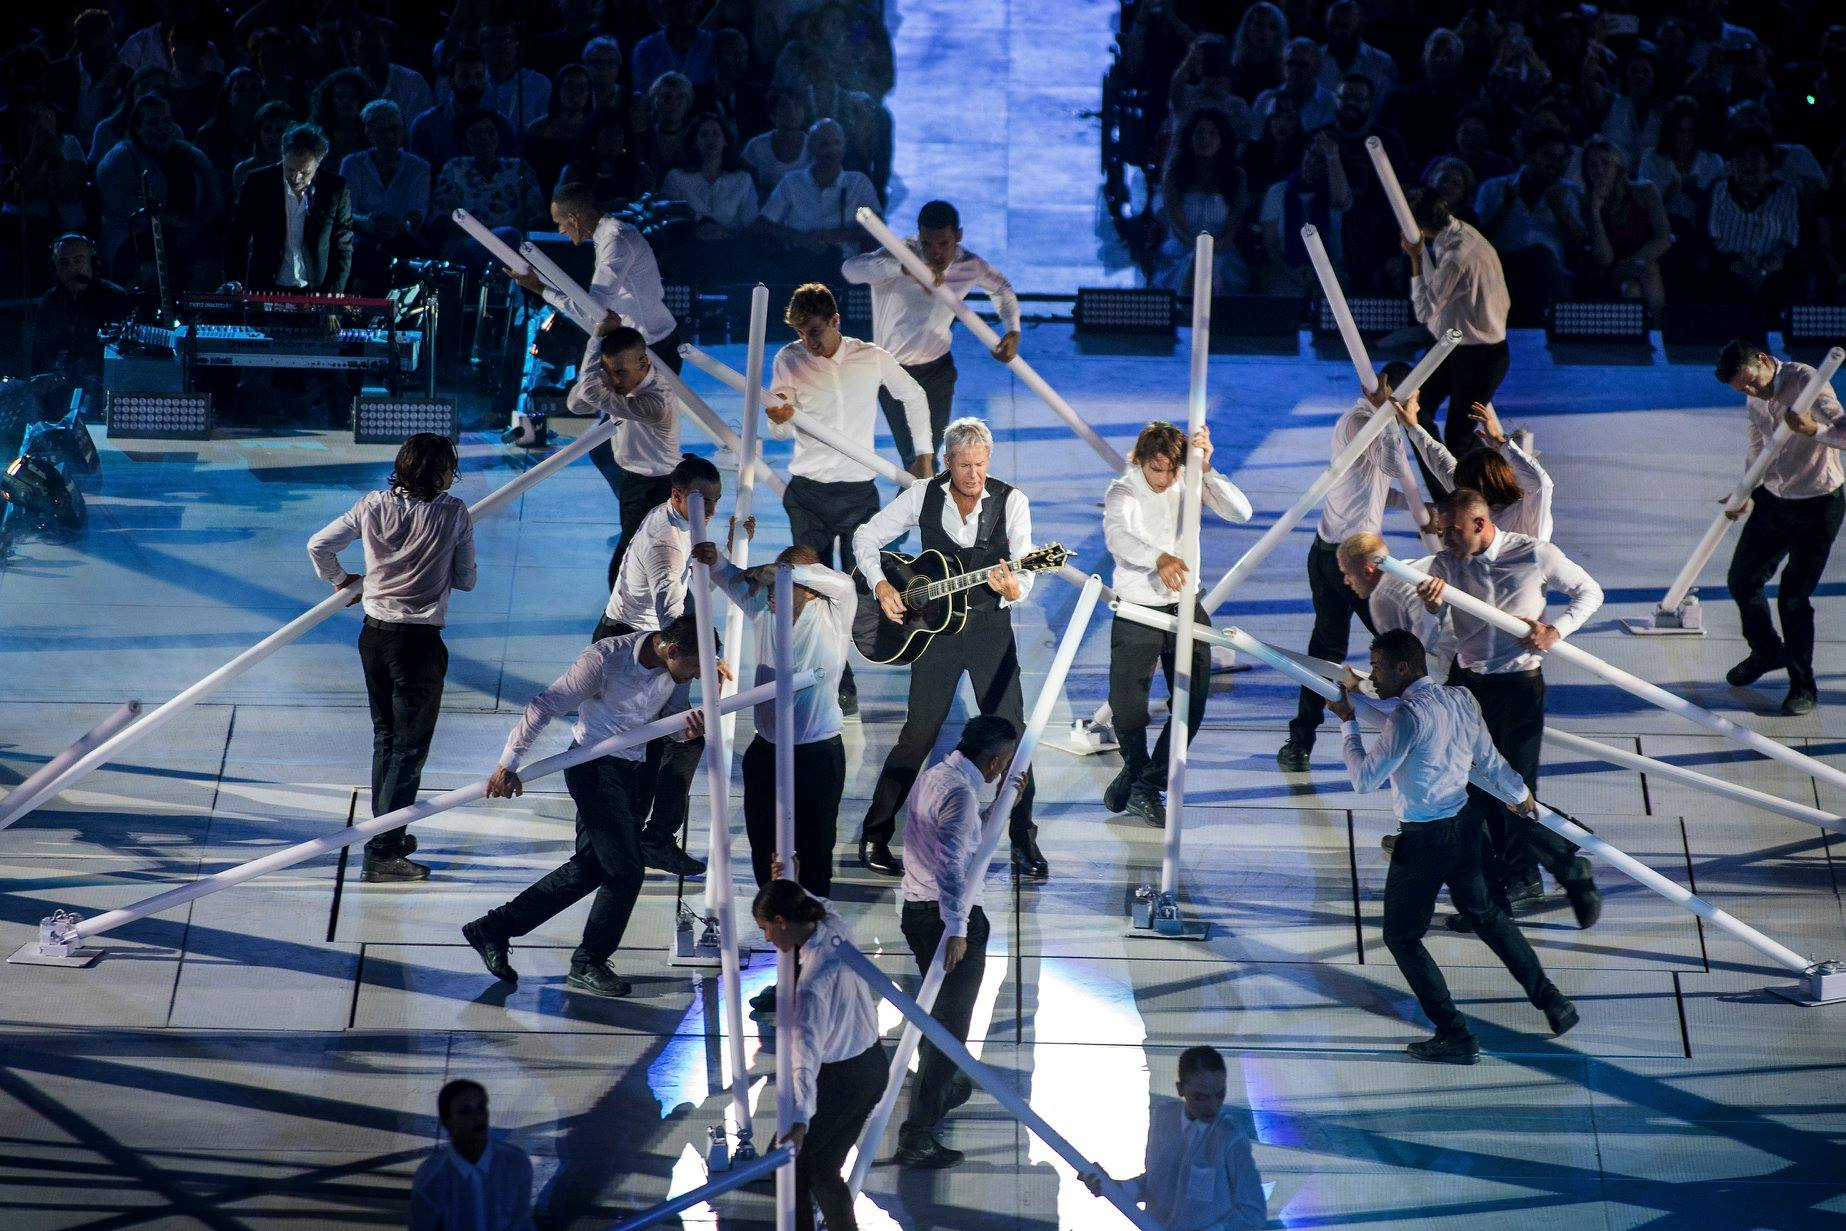 claudio baglioni arena di verona italia italy 50 al centro highline trickline show funambule circus performance spectacle suisse Slackline Lyell Grunberg  (3).jpg